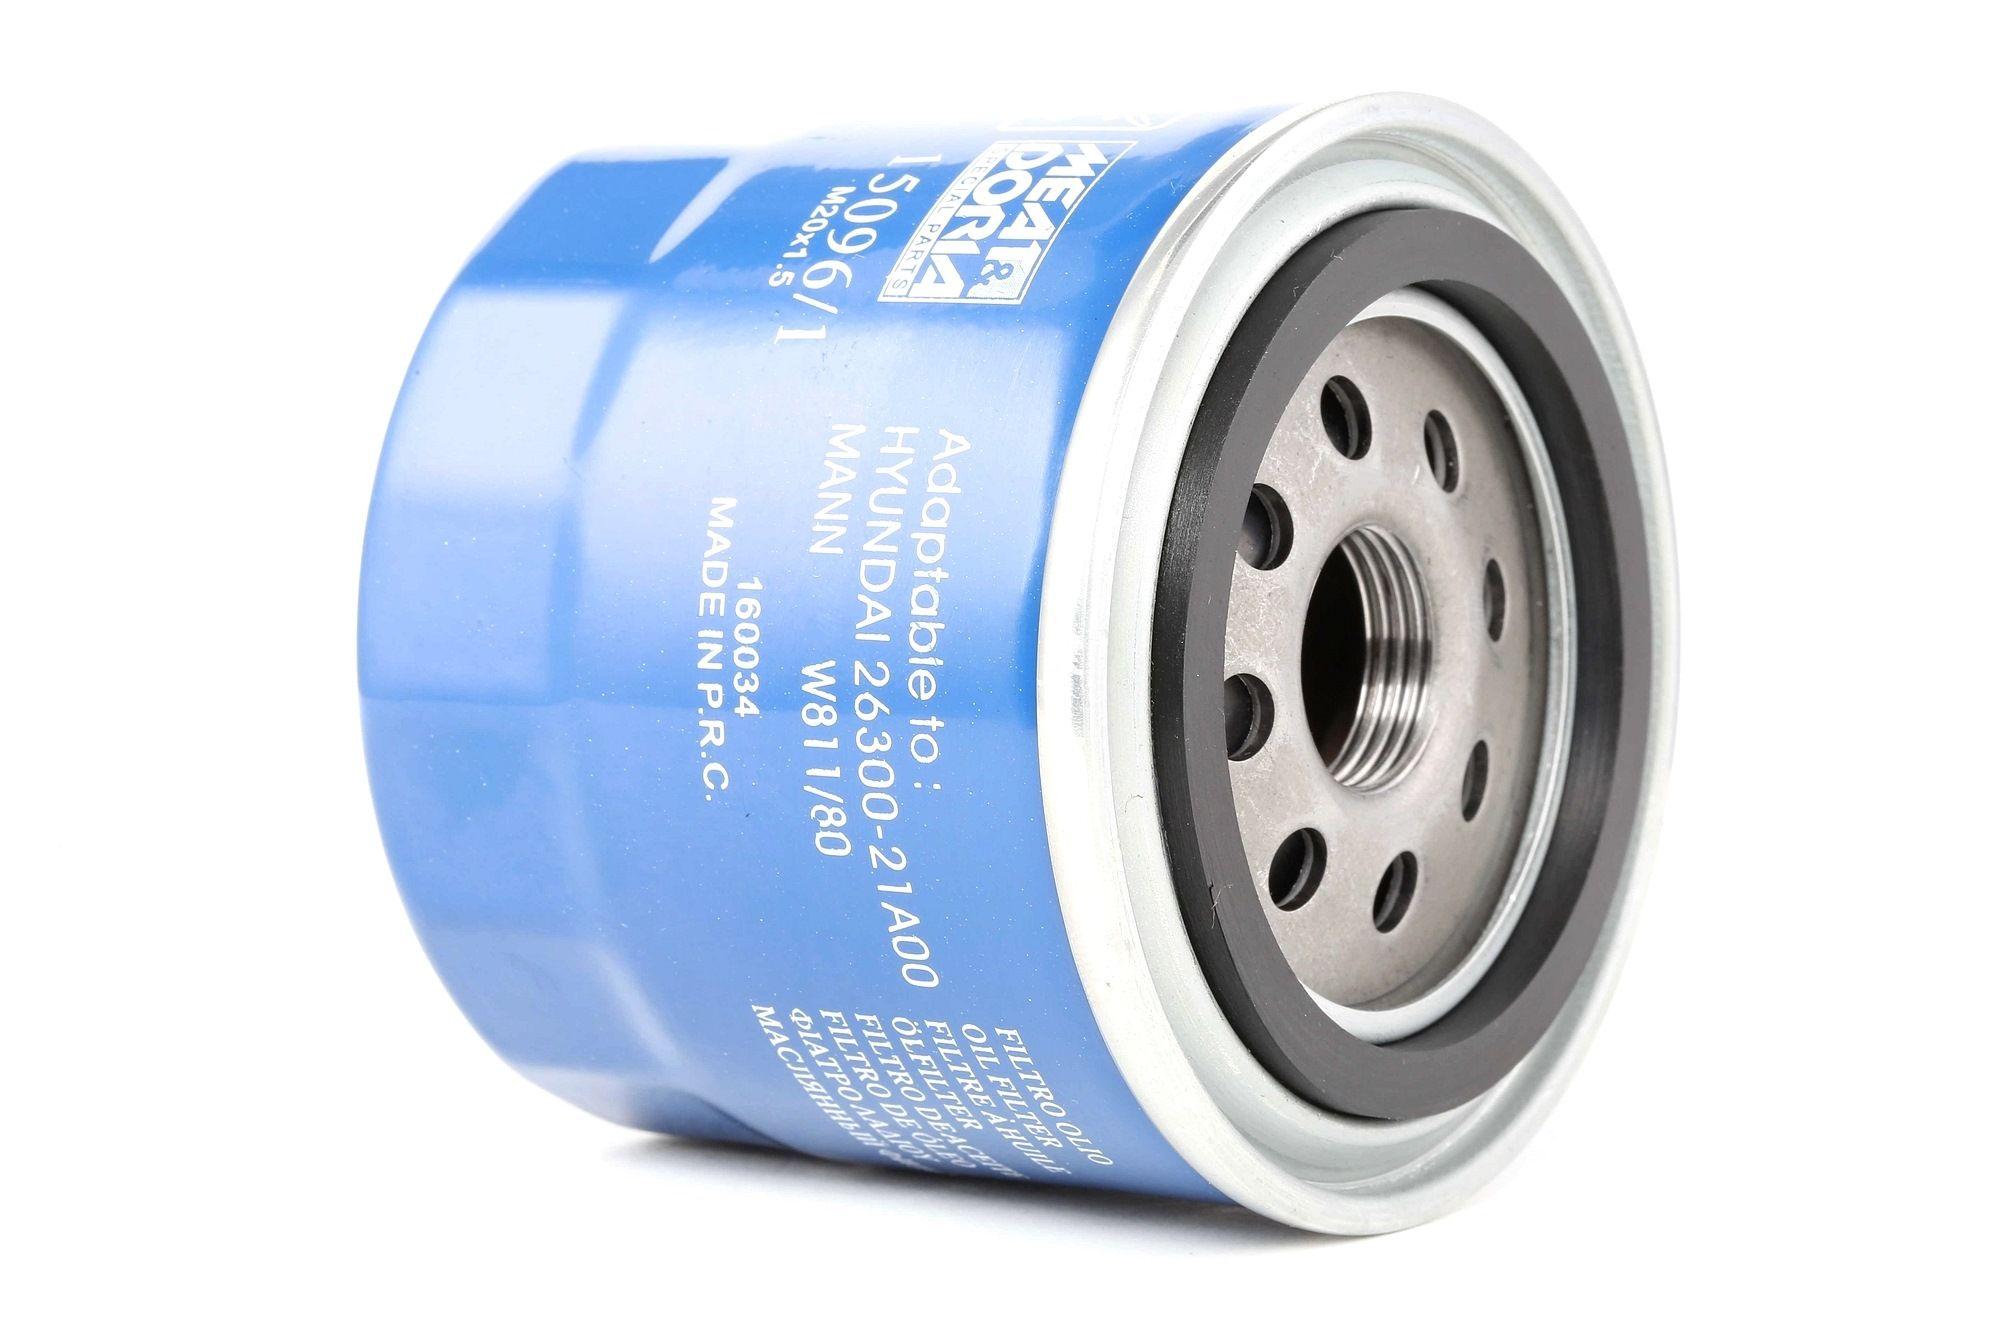 15096/1 MEAT & DORIA Anschraubfilter Ø: 80mm, Höhe: 75mm Ölfilter 15096/1 günstig kaufen